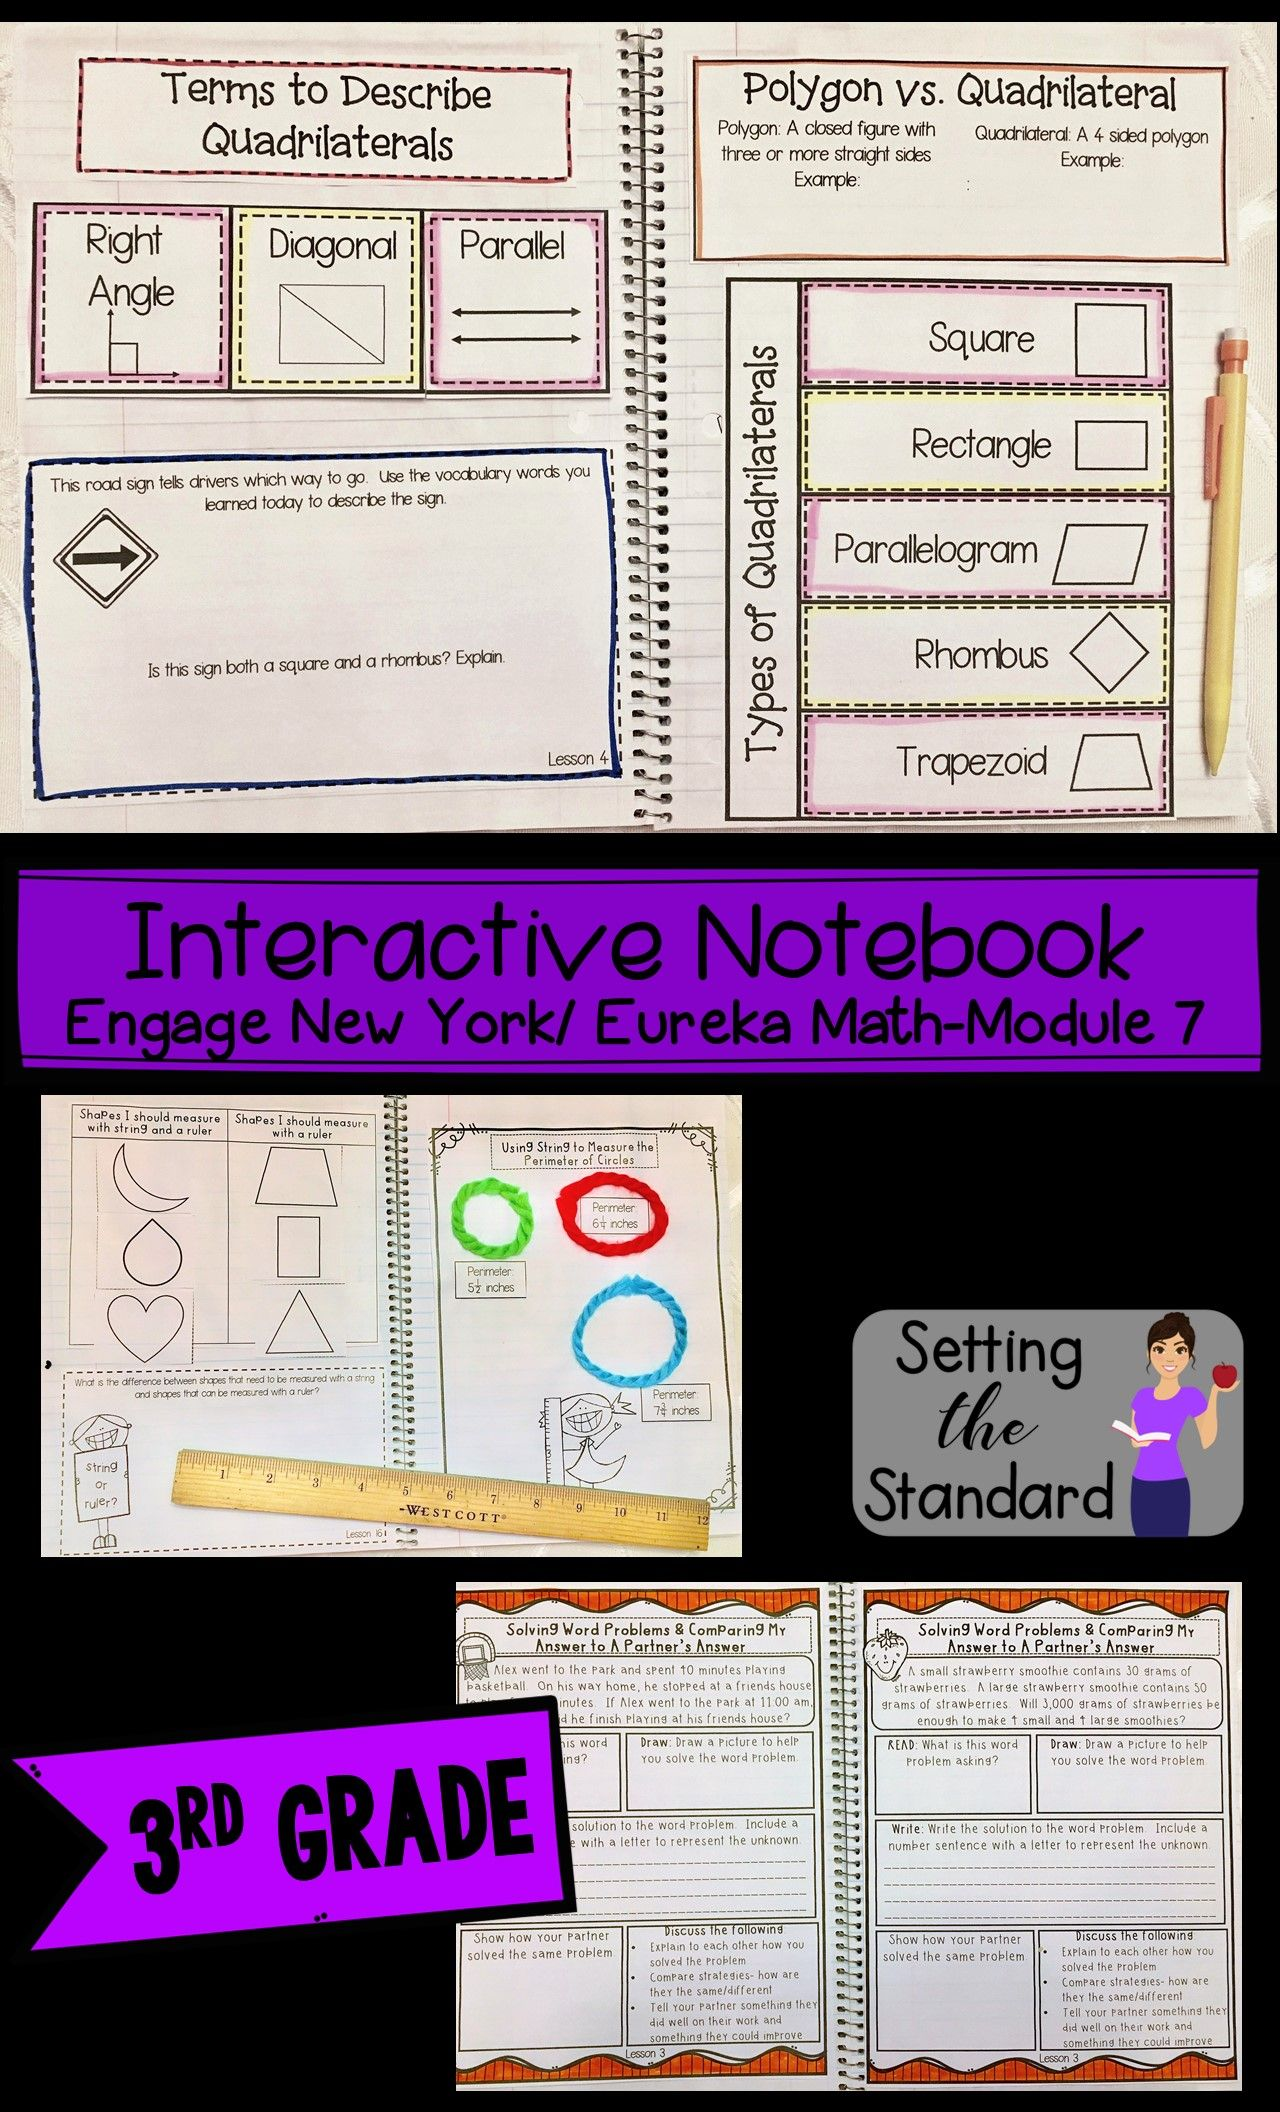 Interactive Notebook Module 7 3rd Grade Engage New York